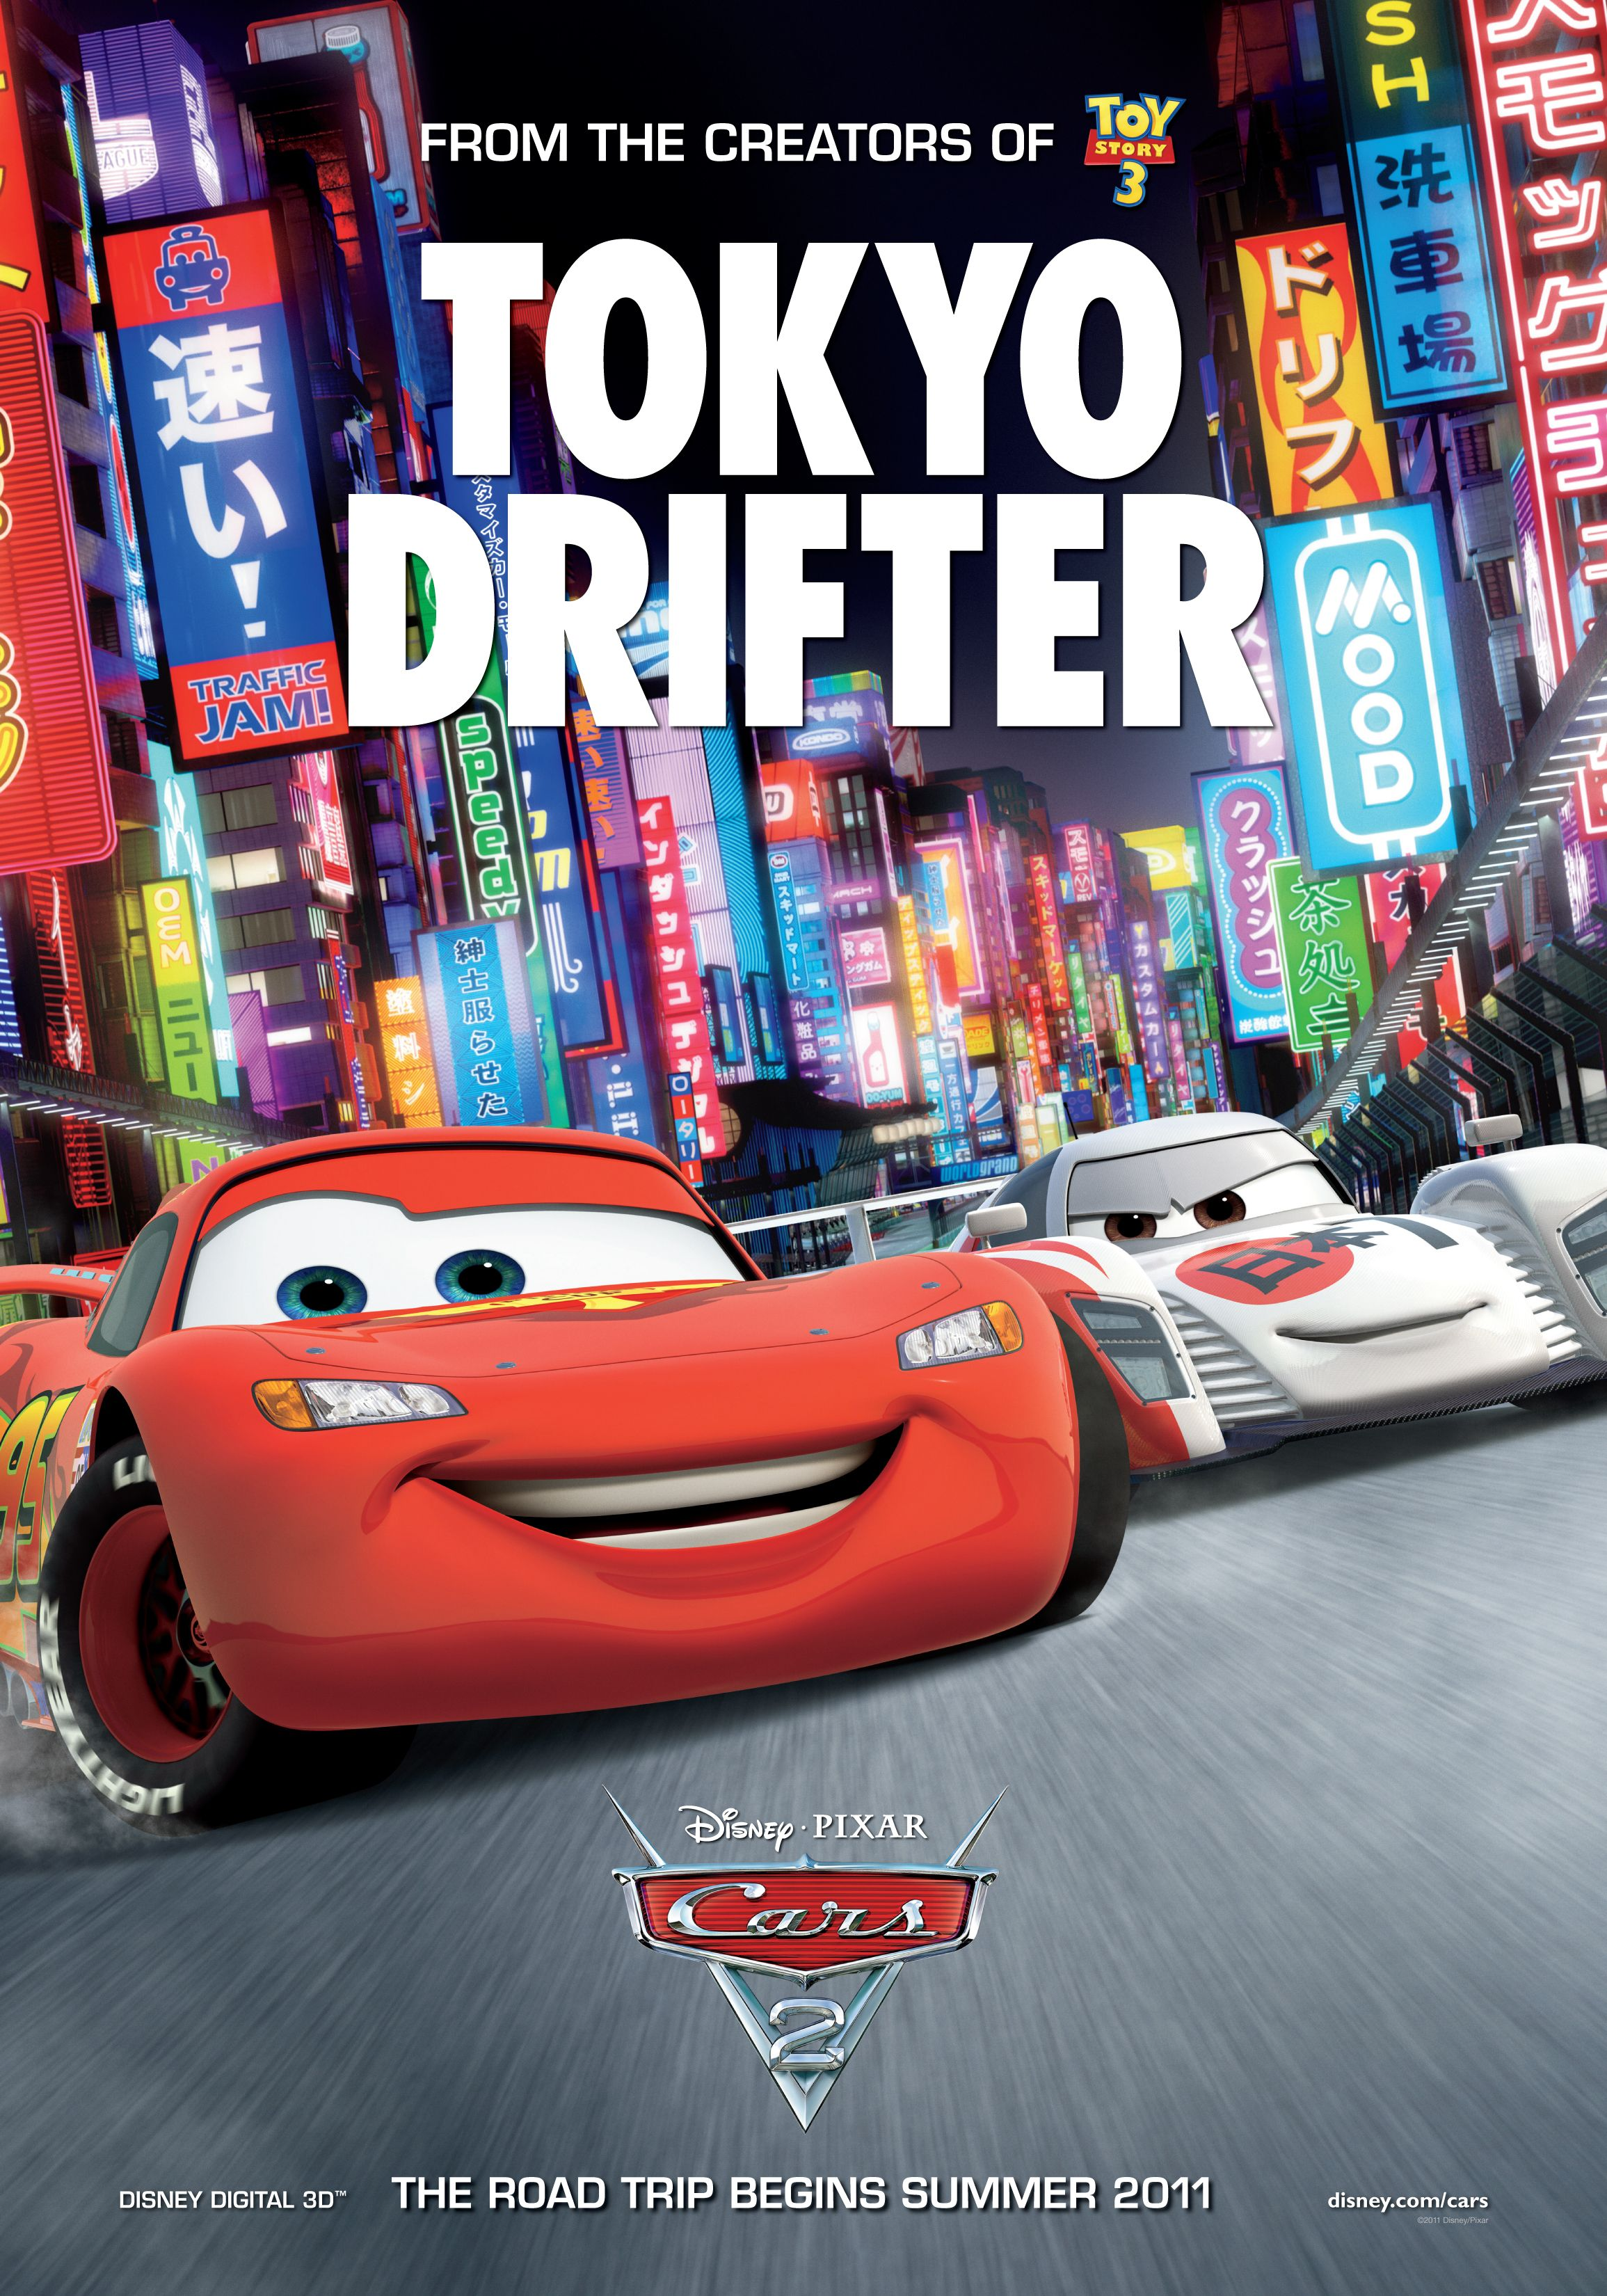 Disney Pixar Cars 2 Free Family Fun Craft Activities And More Disney Cars Movie Disney Cars Cars 2 Movie